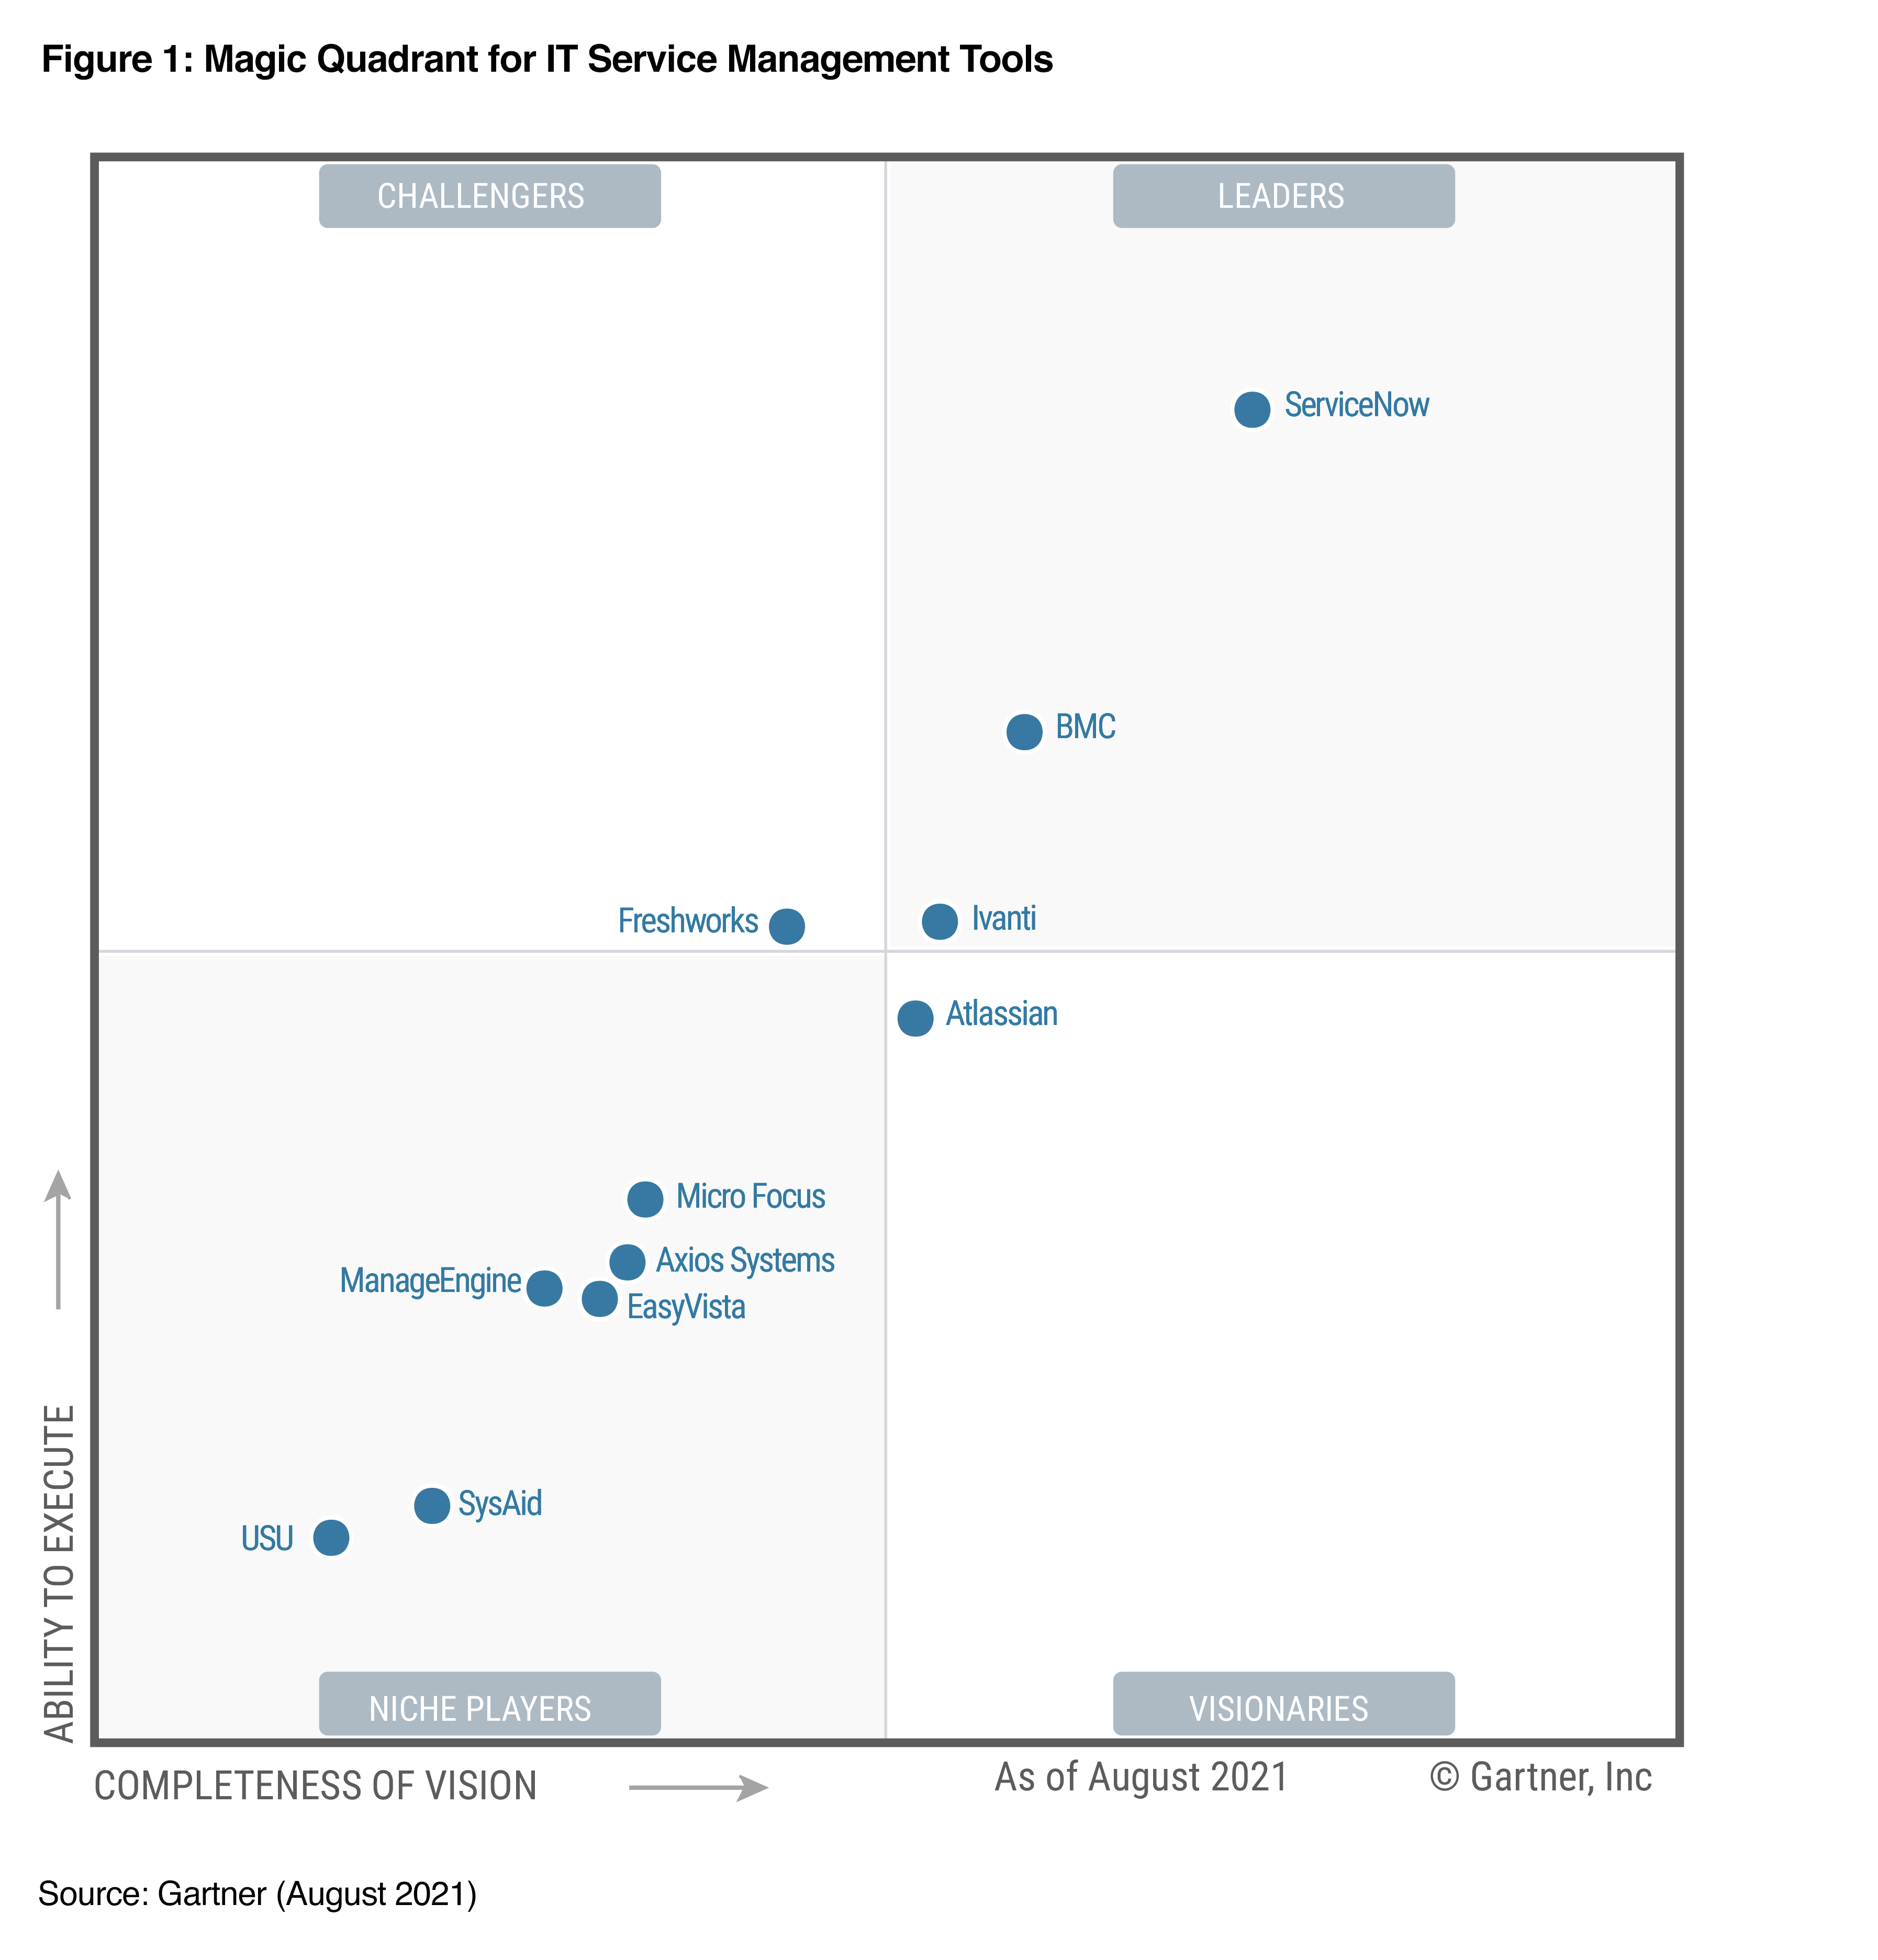 Magic Quadrant for IT Service Management Planning Tools